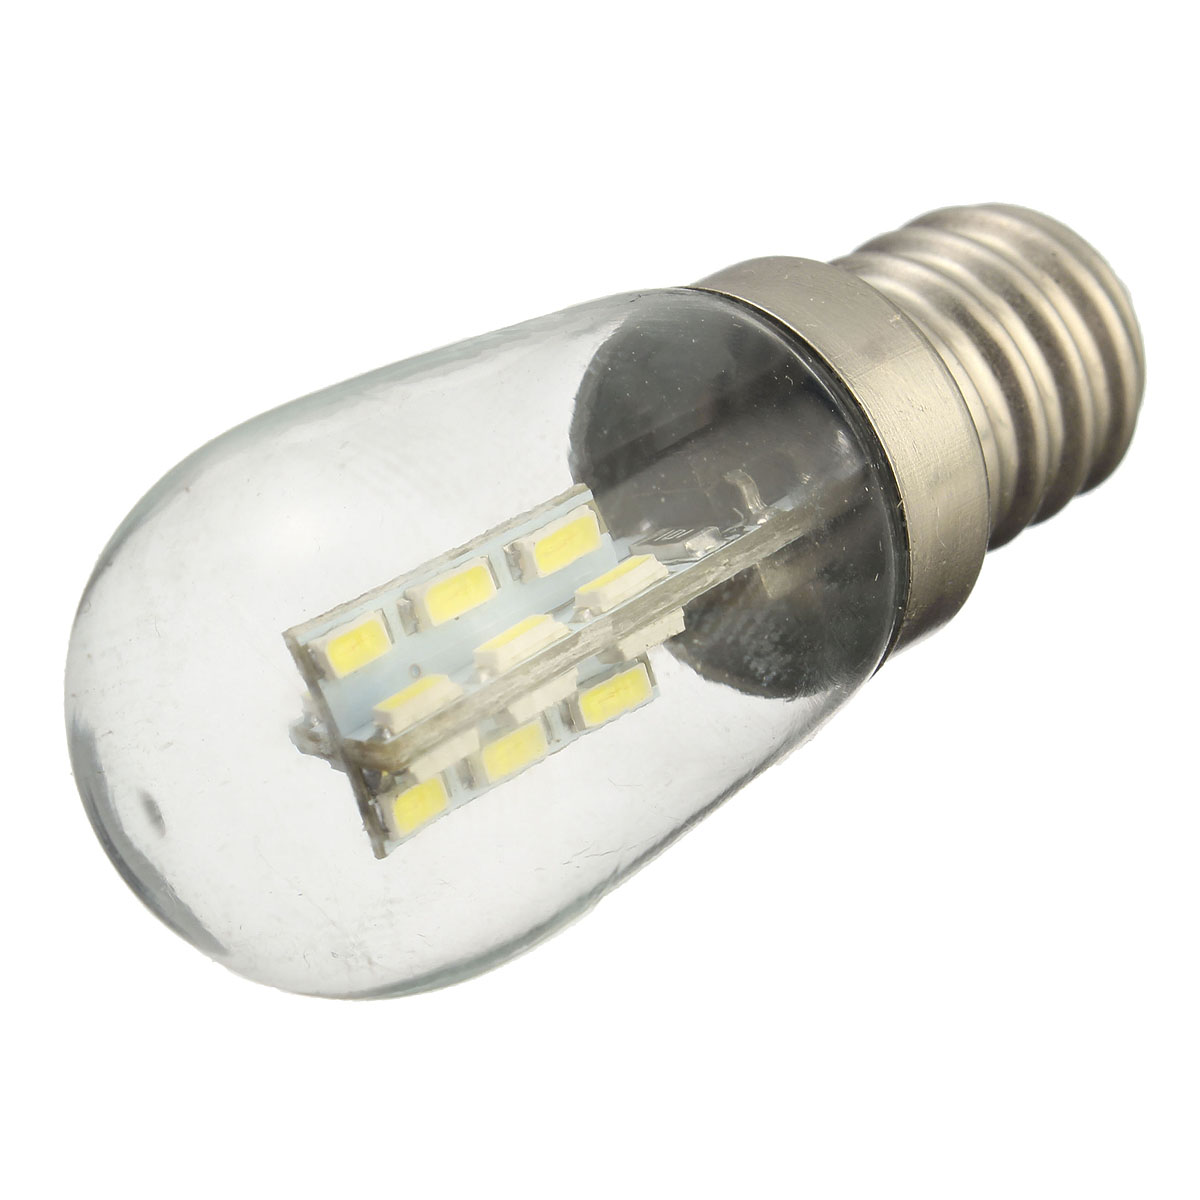 E12 2W 24 SMD 3014 LED Pure White Warm White Bed Lamp Light Bulb AC220V